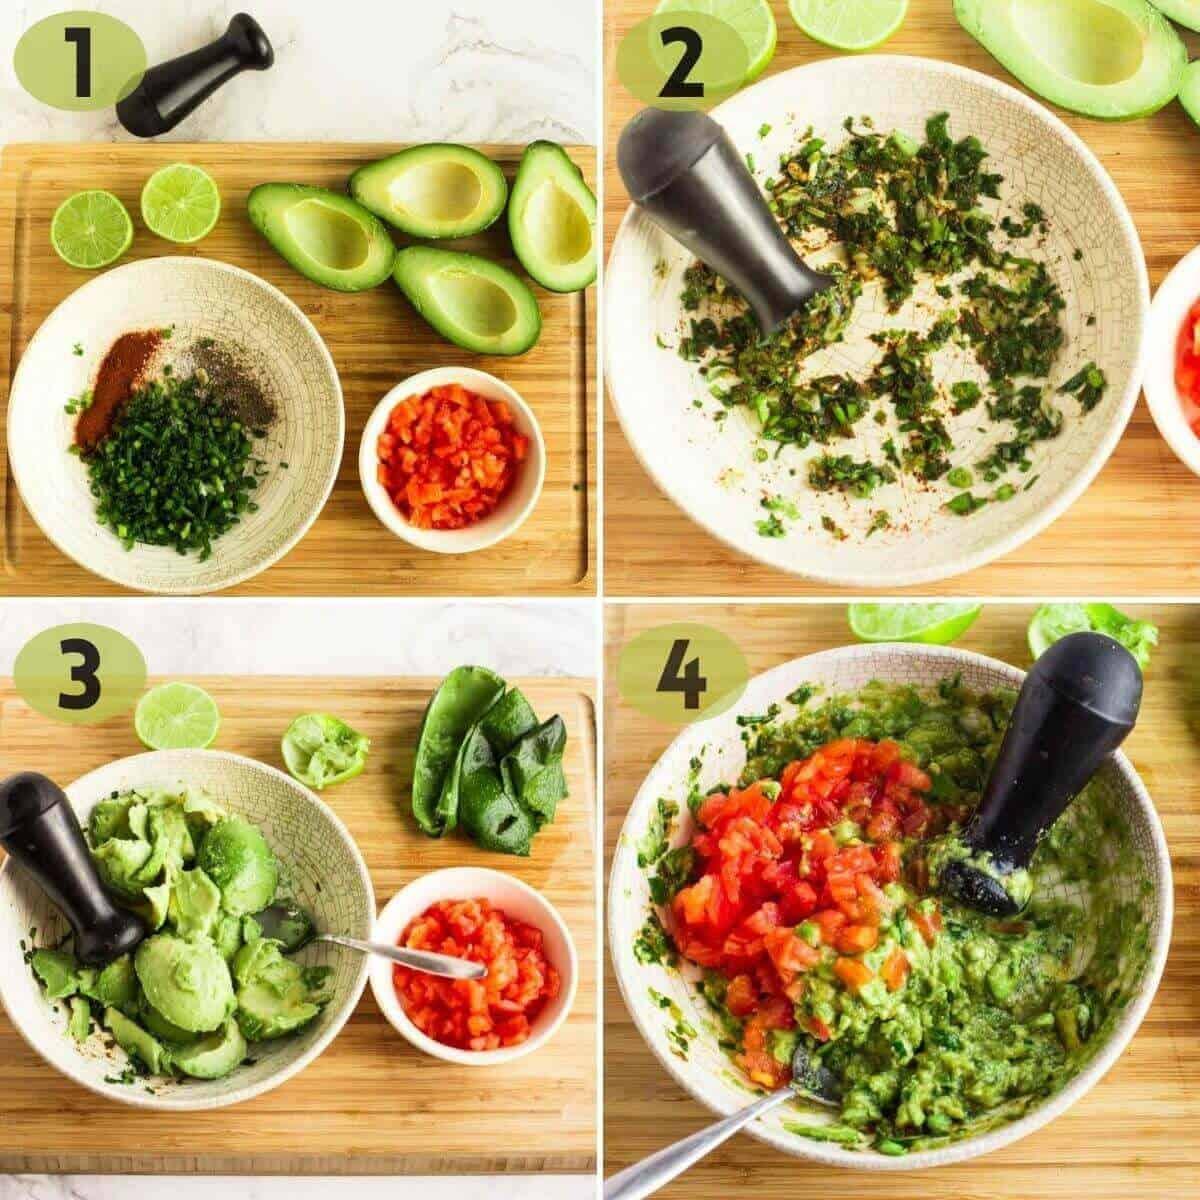 steps to make guacamole